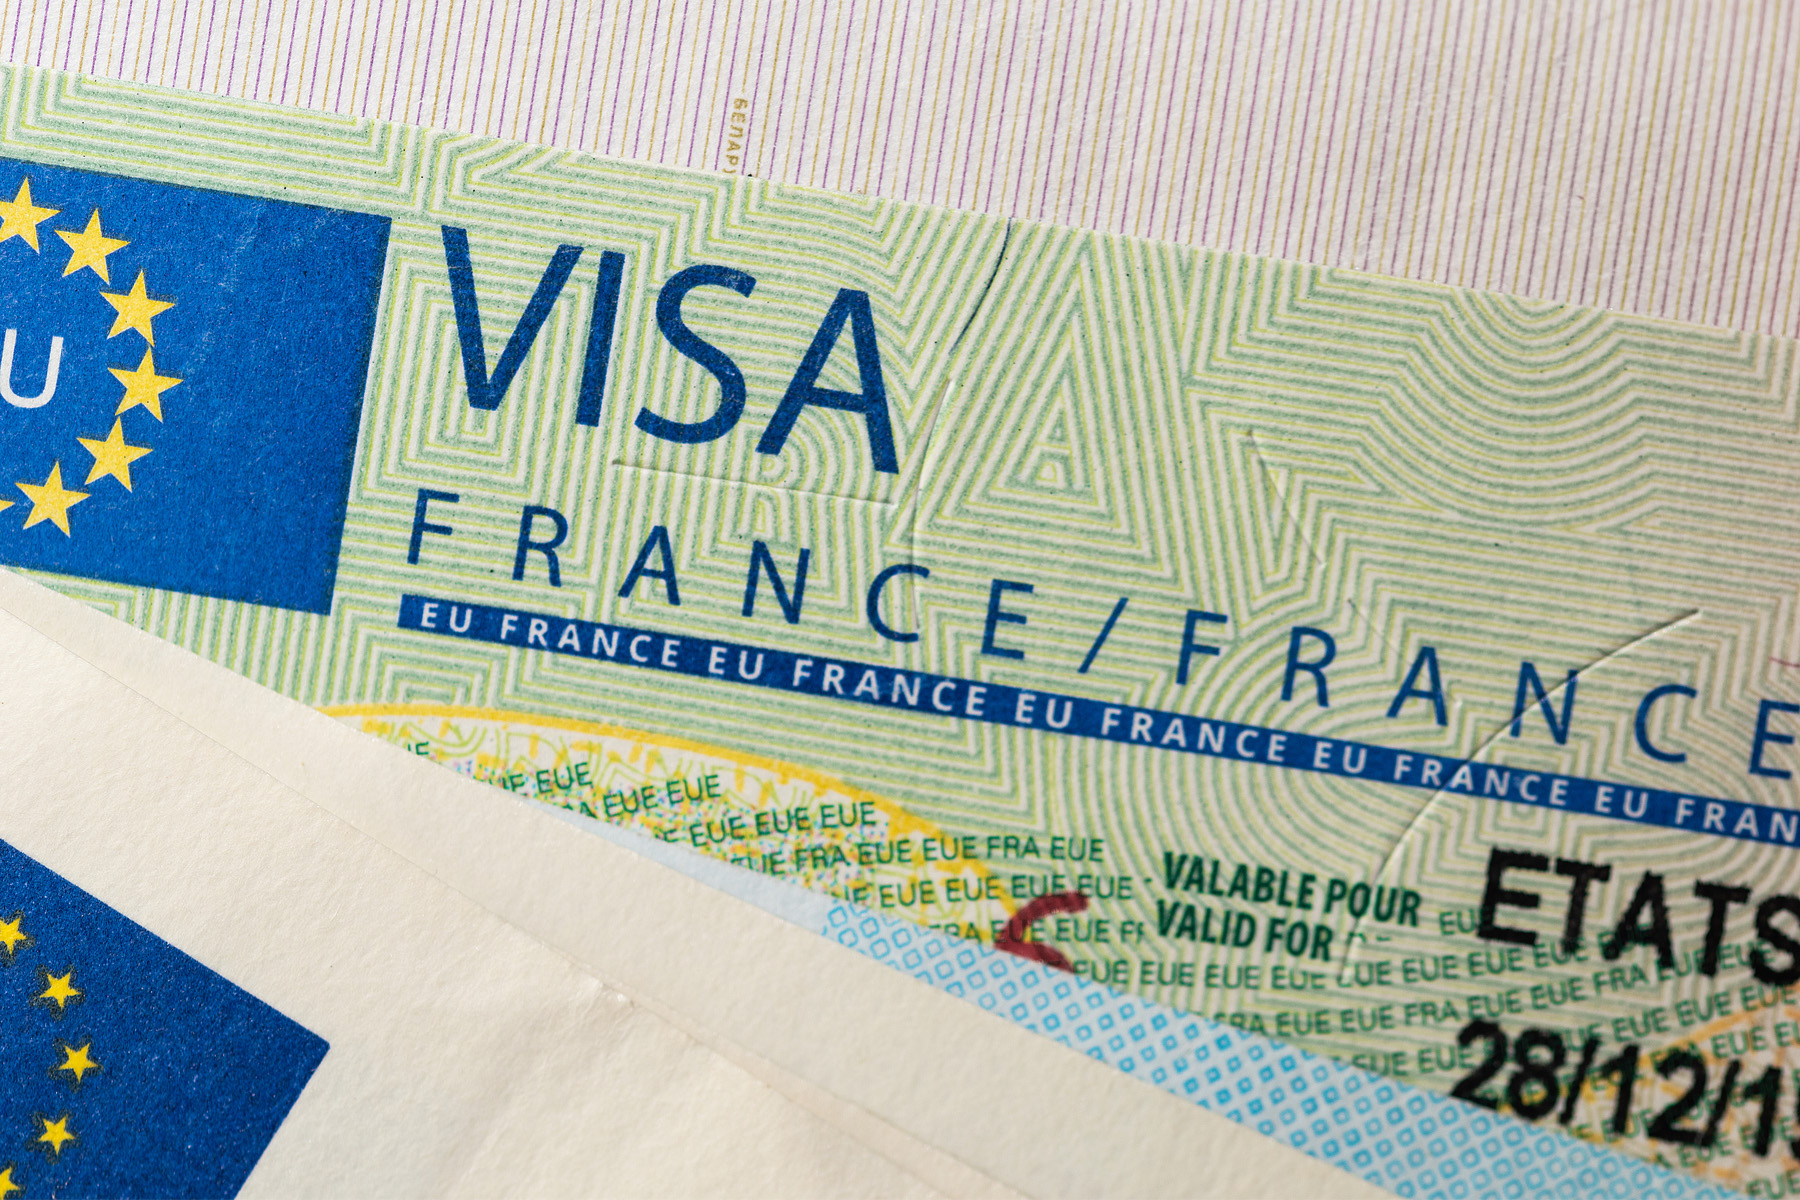 Closeup of a French visa